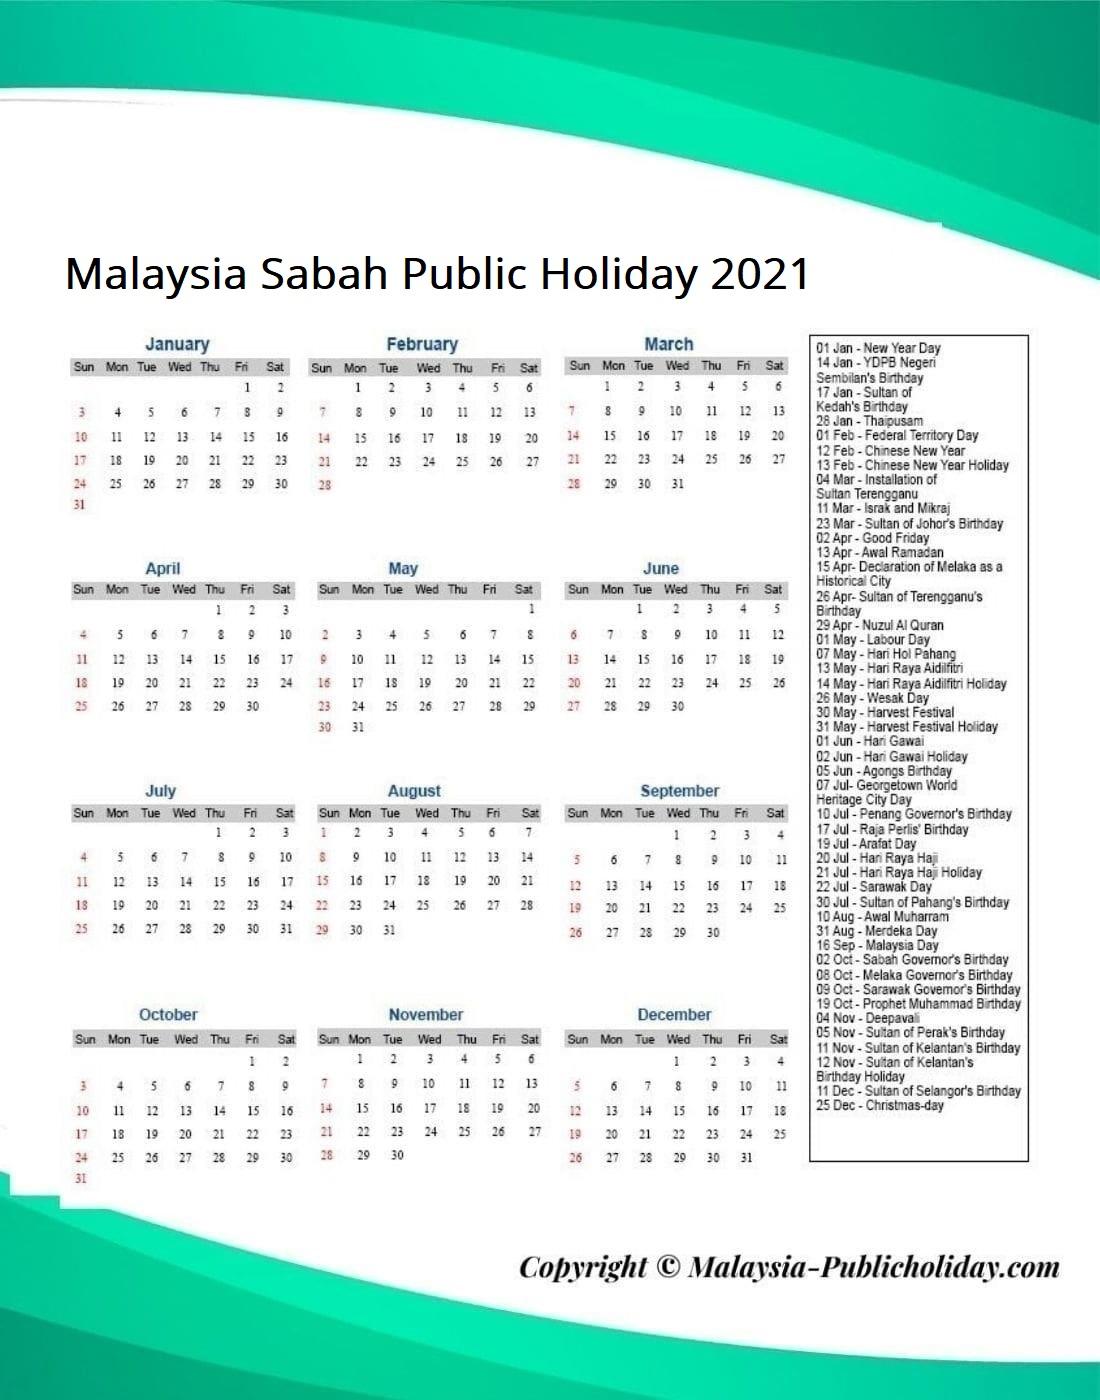 Sabah Public Holiday 2021